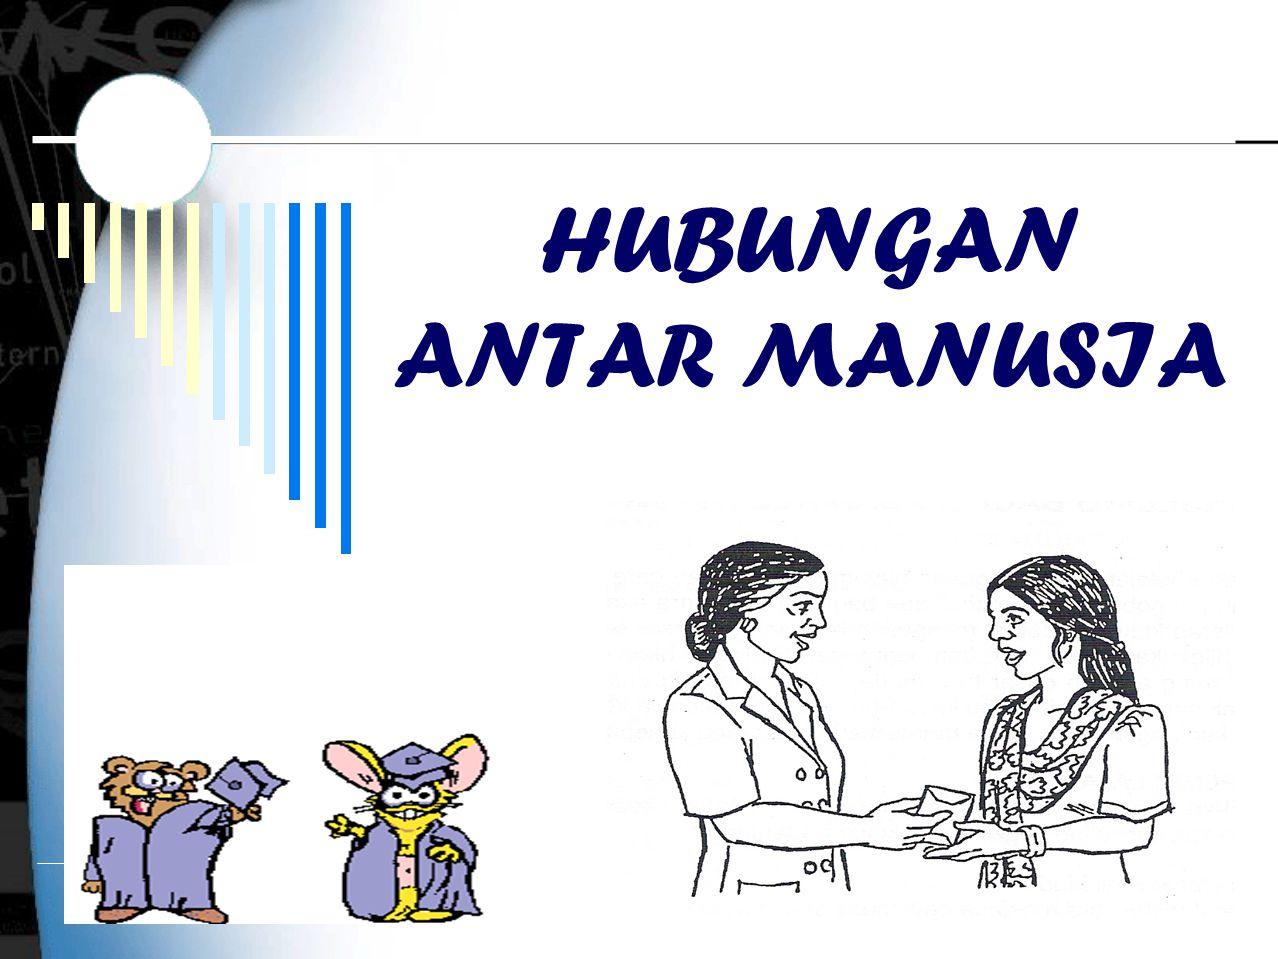 1 HUBUNGAN ANTAR MANUSIA